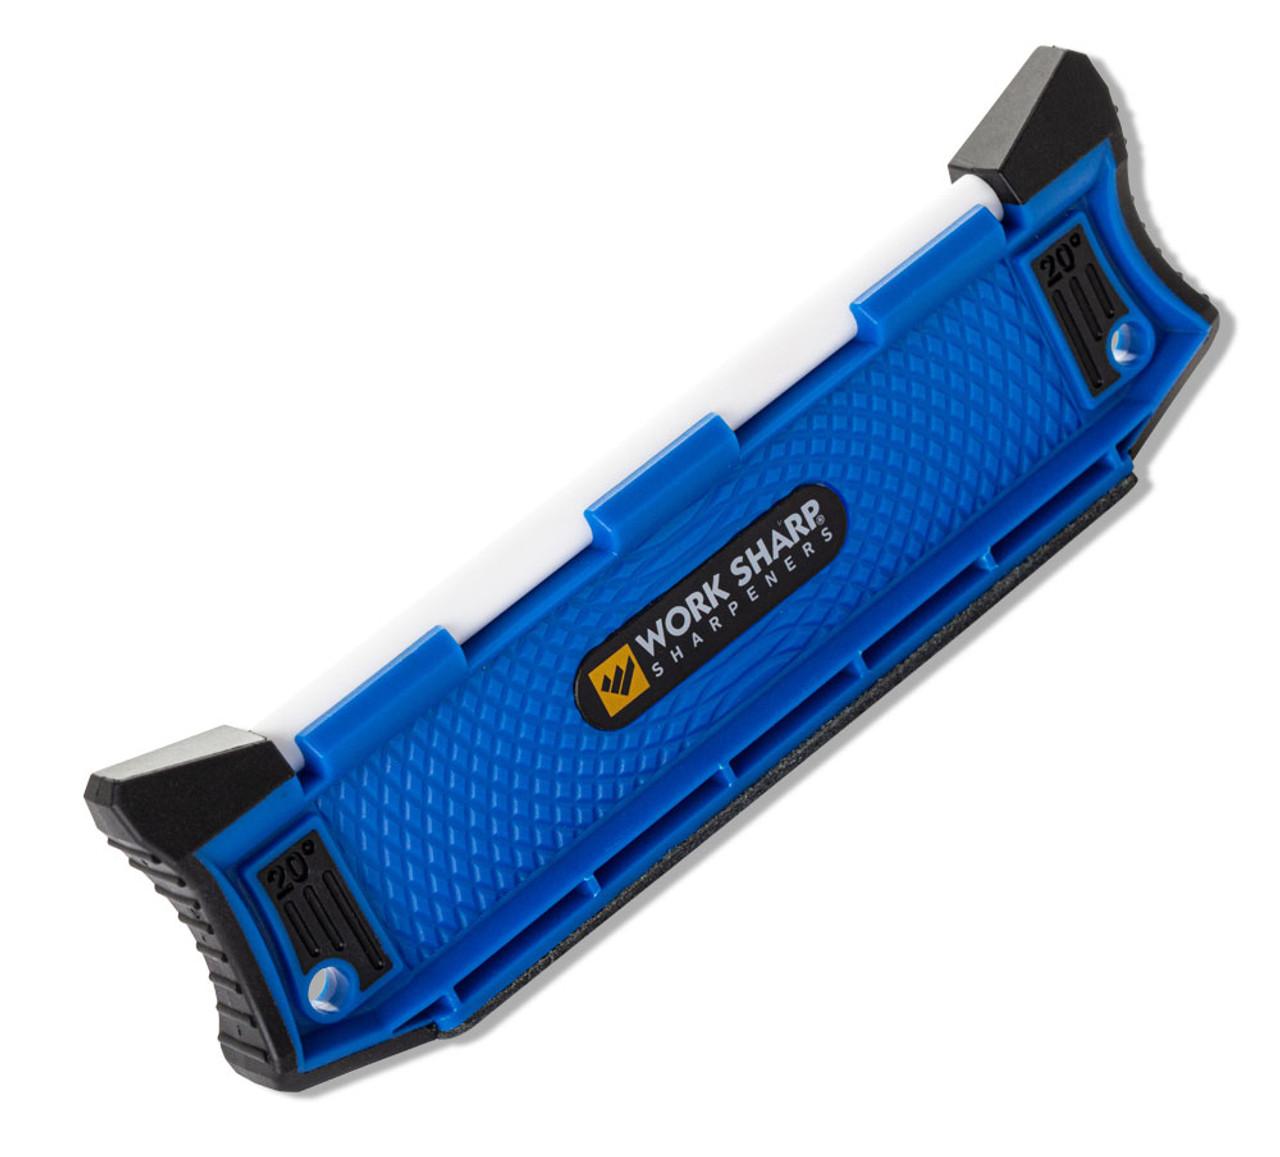 Benchmade / Work Sharp 20° Guided Hone Tool, BM50080